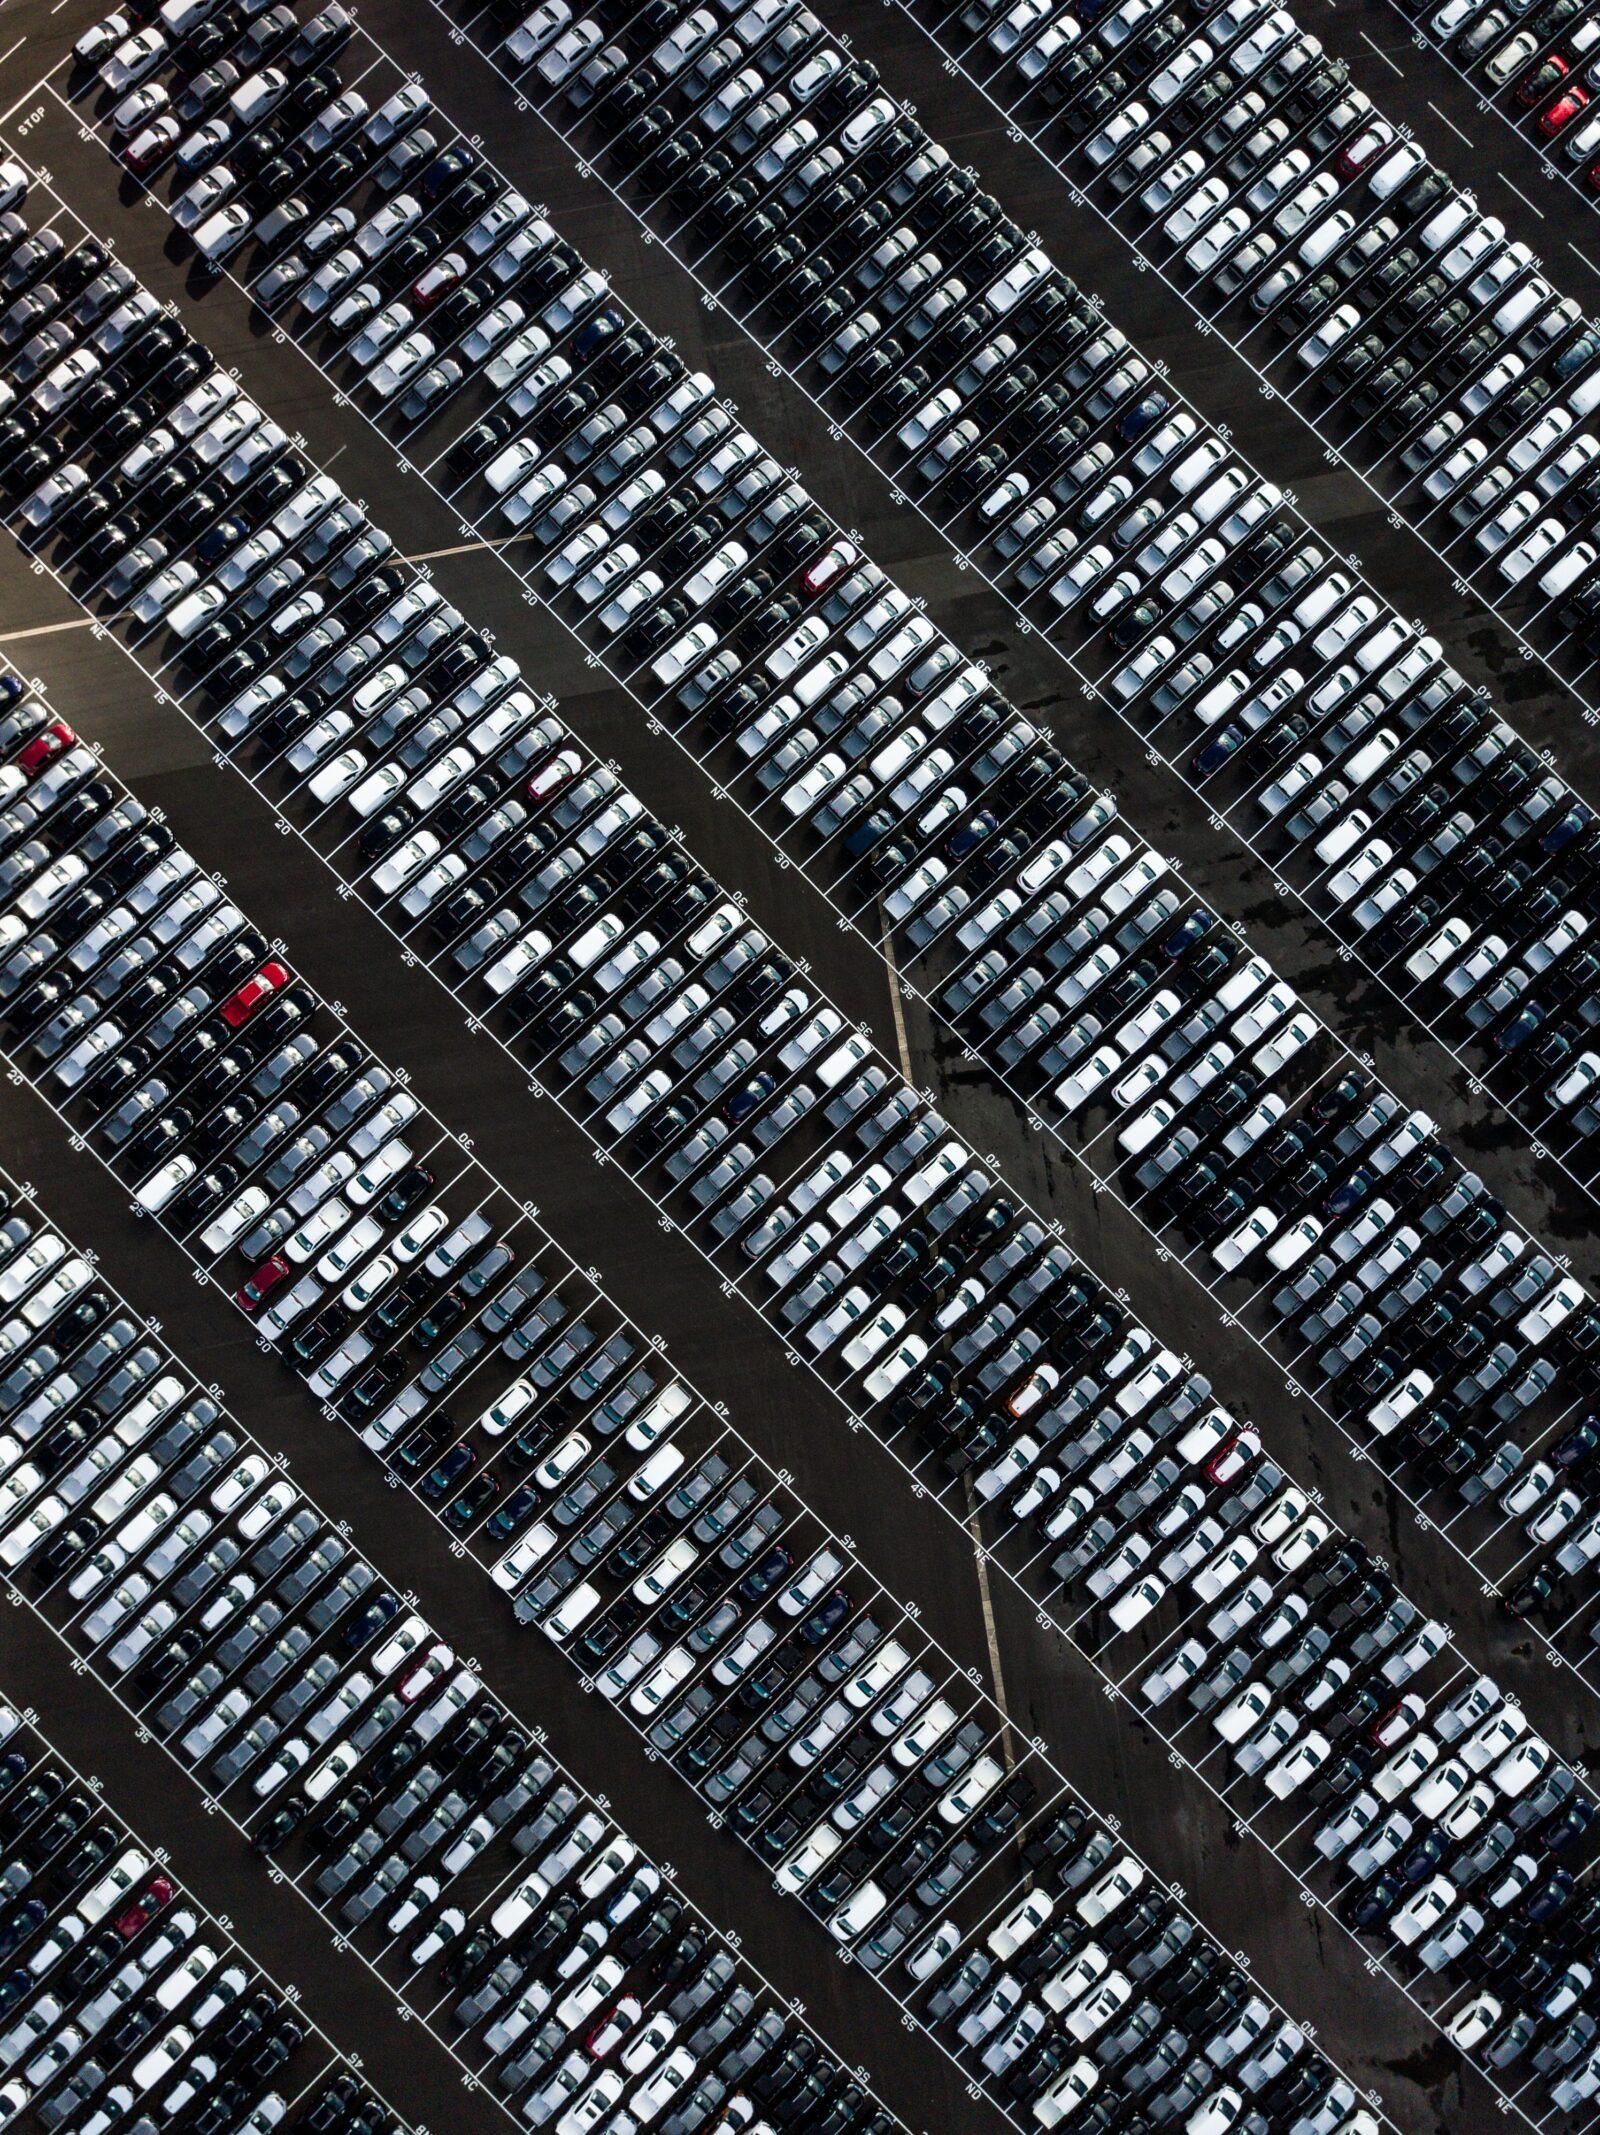 cars-parkinglot-overhead